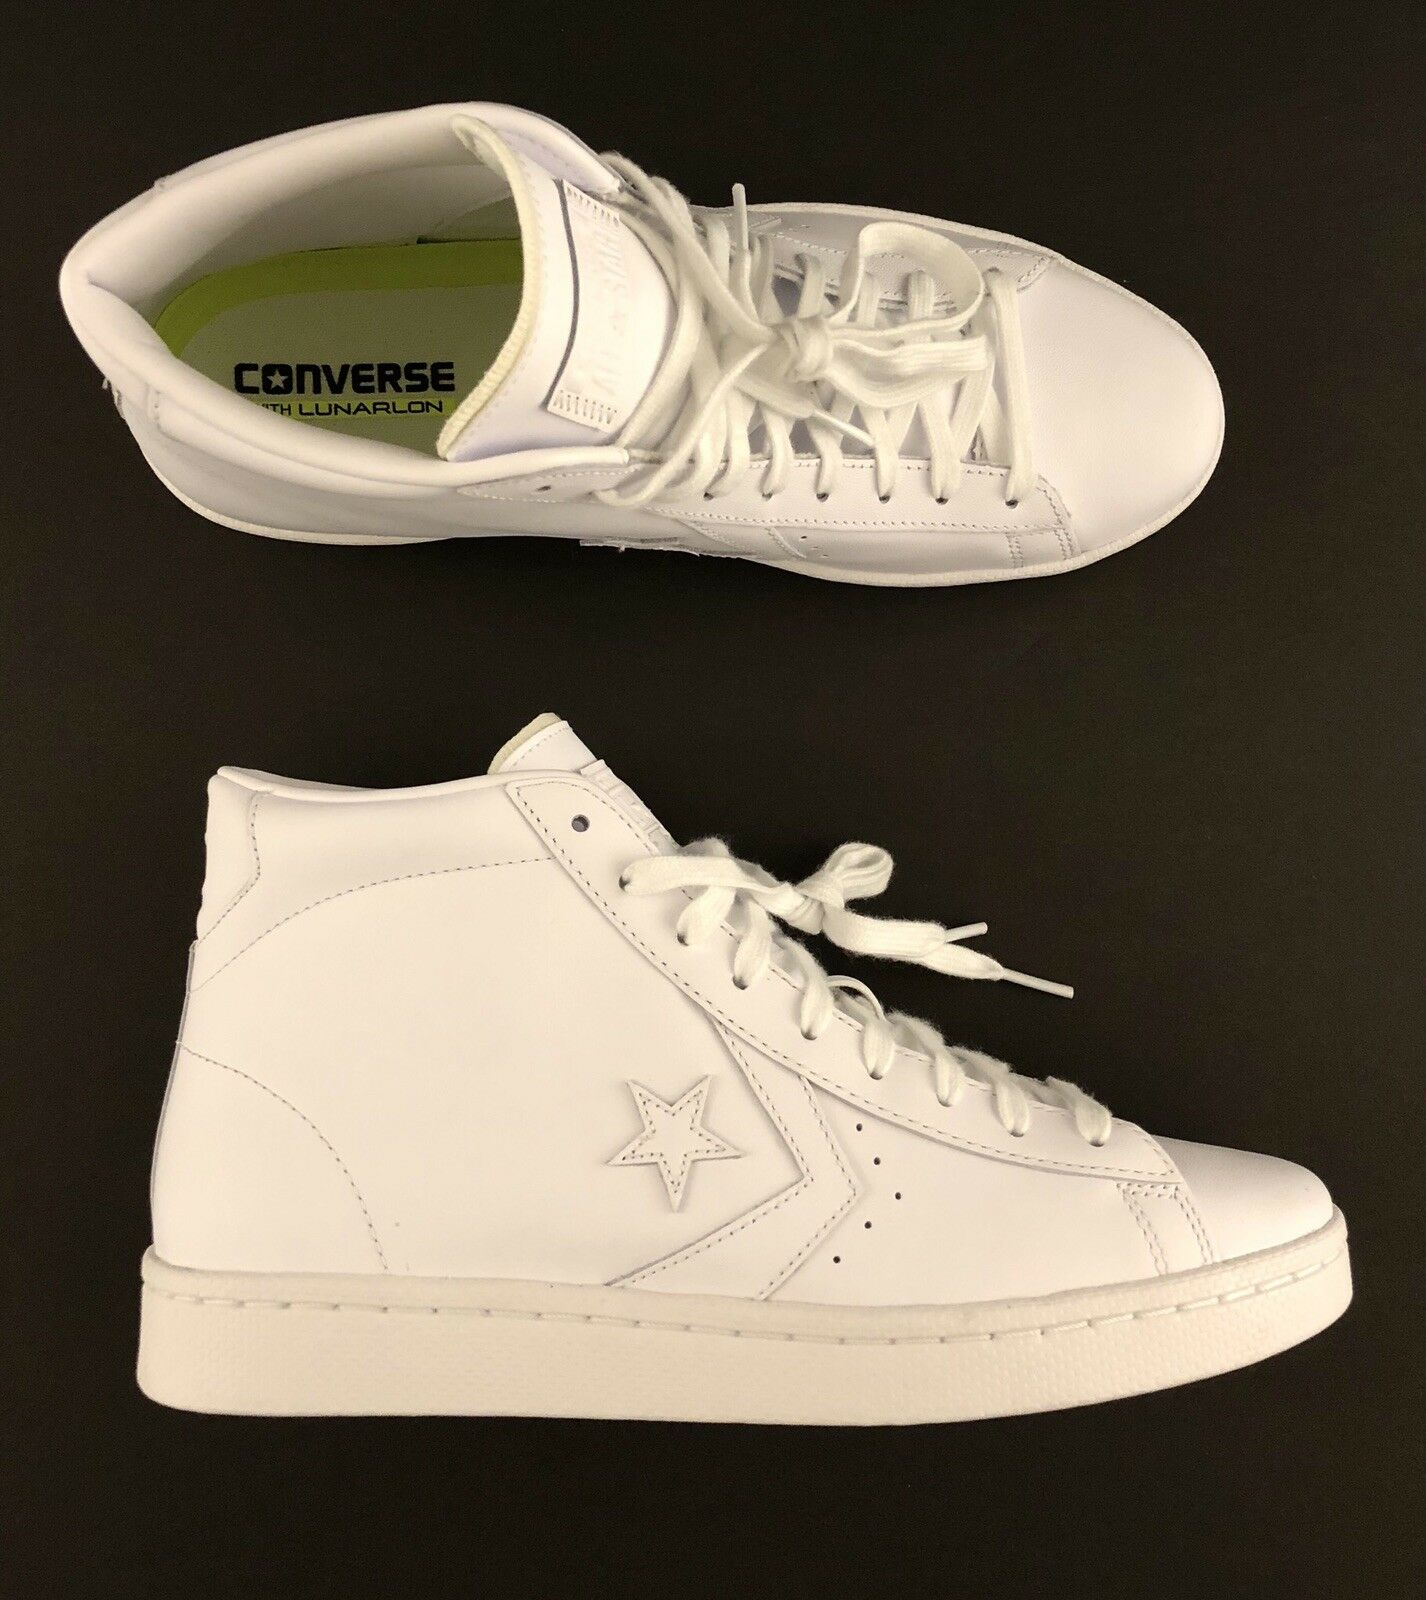 Converse Pro Leather 76 Mid All Star Triple Weiß Casual schuhe (155335C) Größe 9